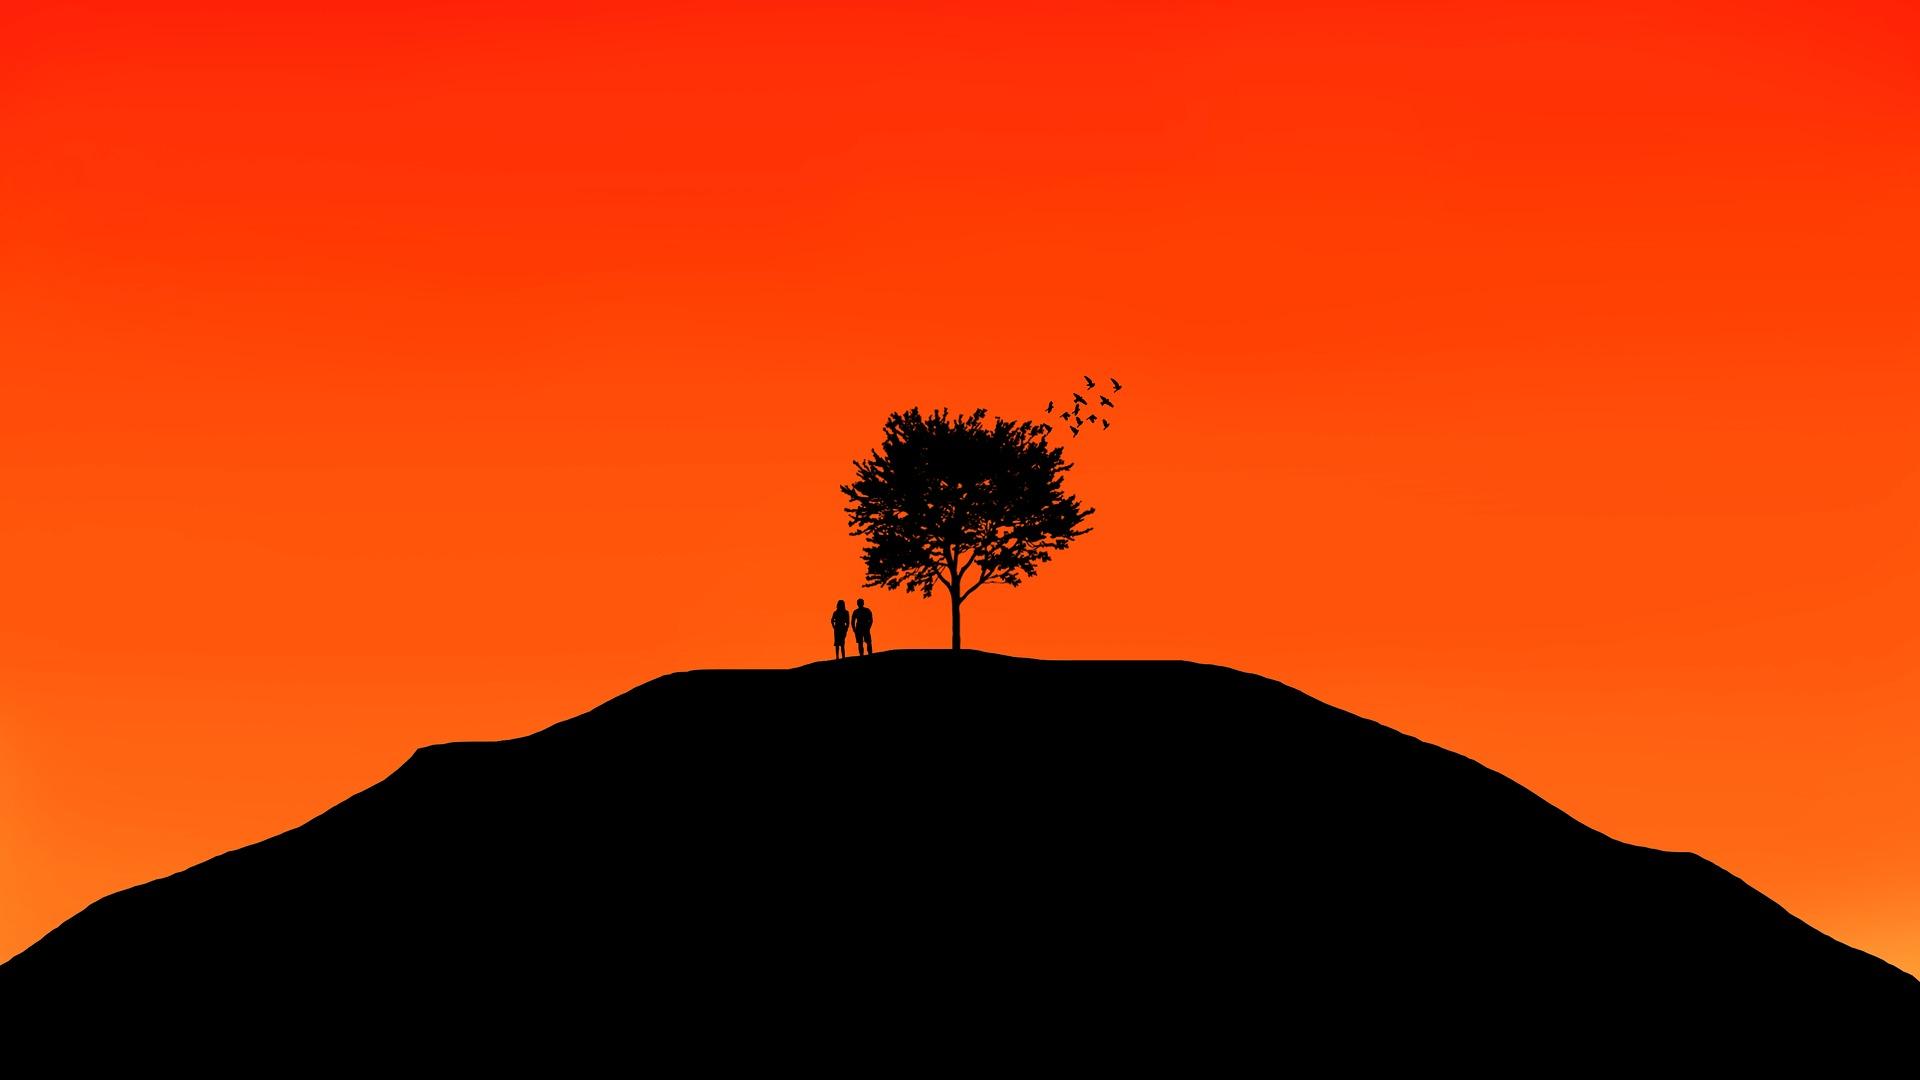 tree-2377575_1920